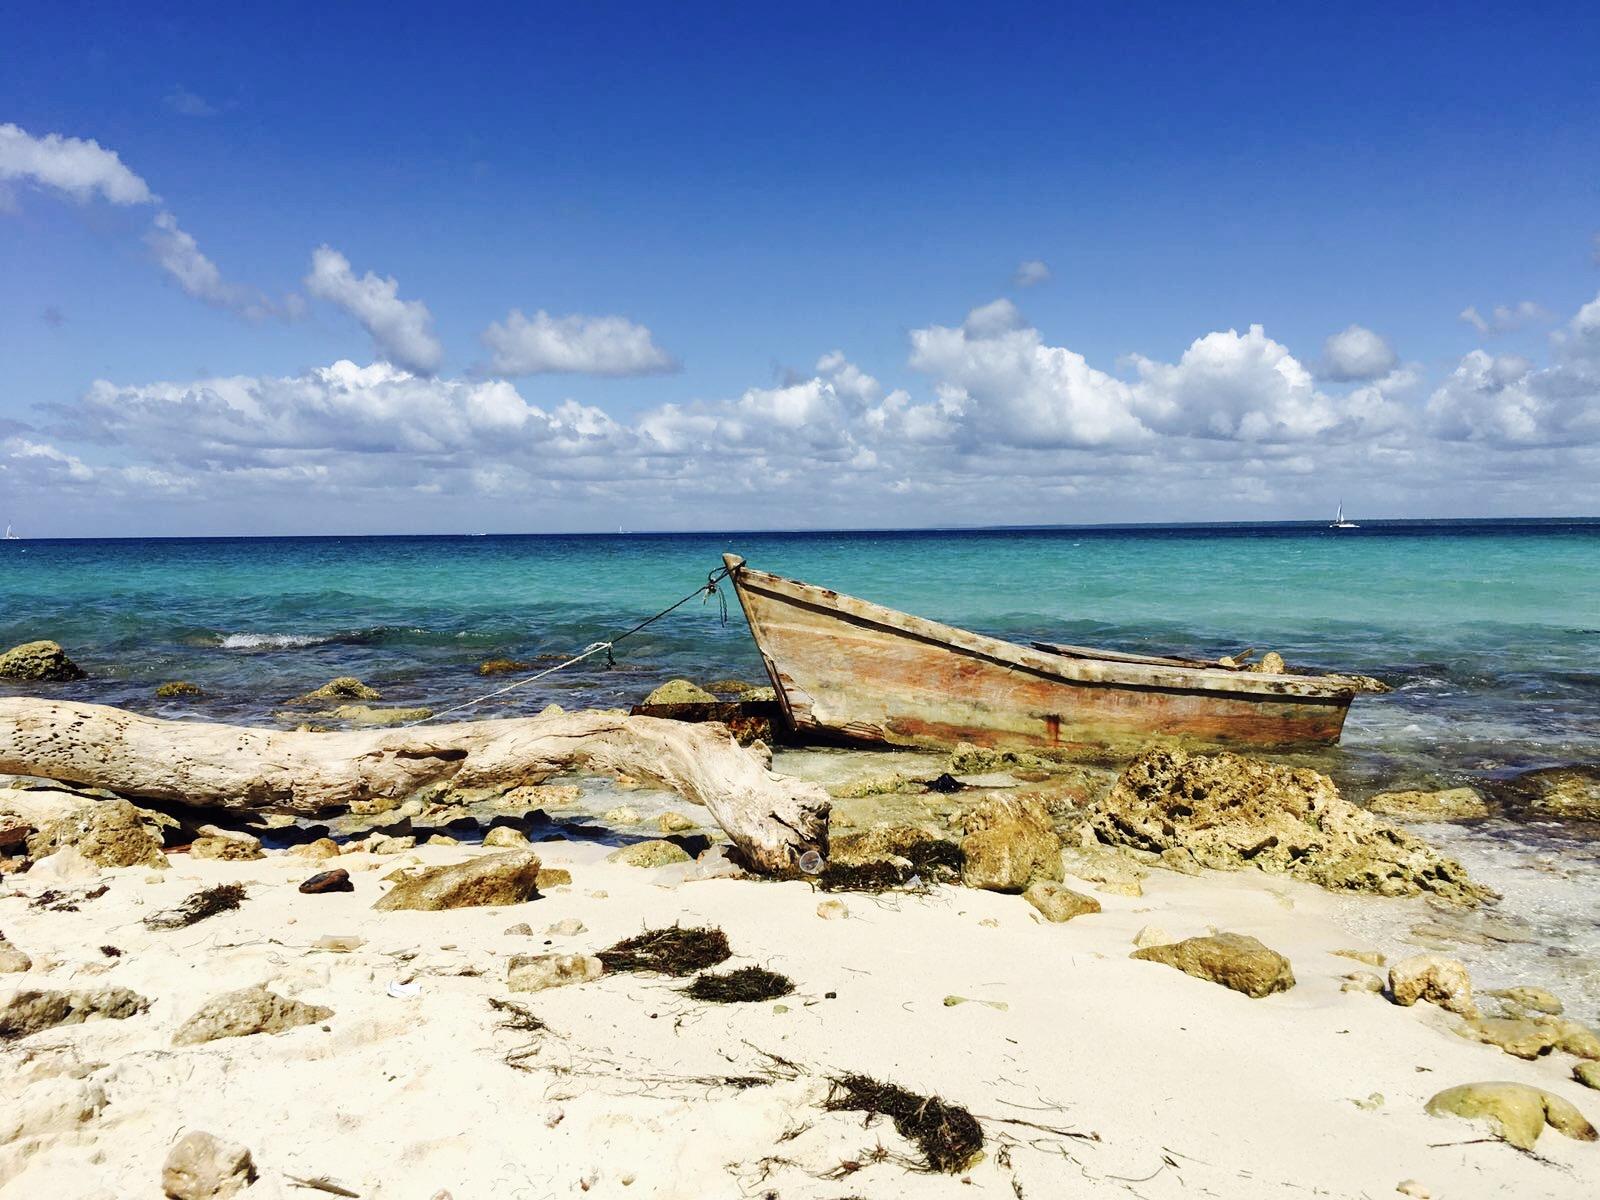 Altes Boot am Strand von Saona Island